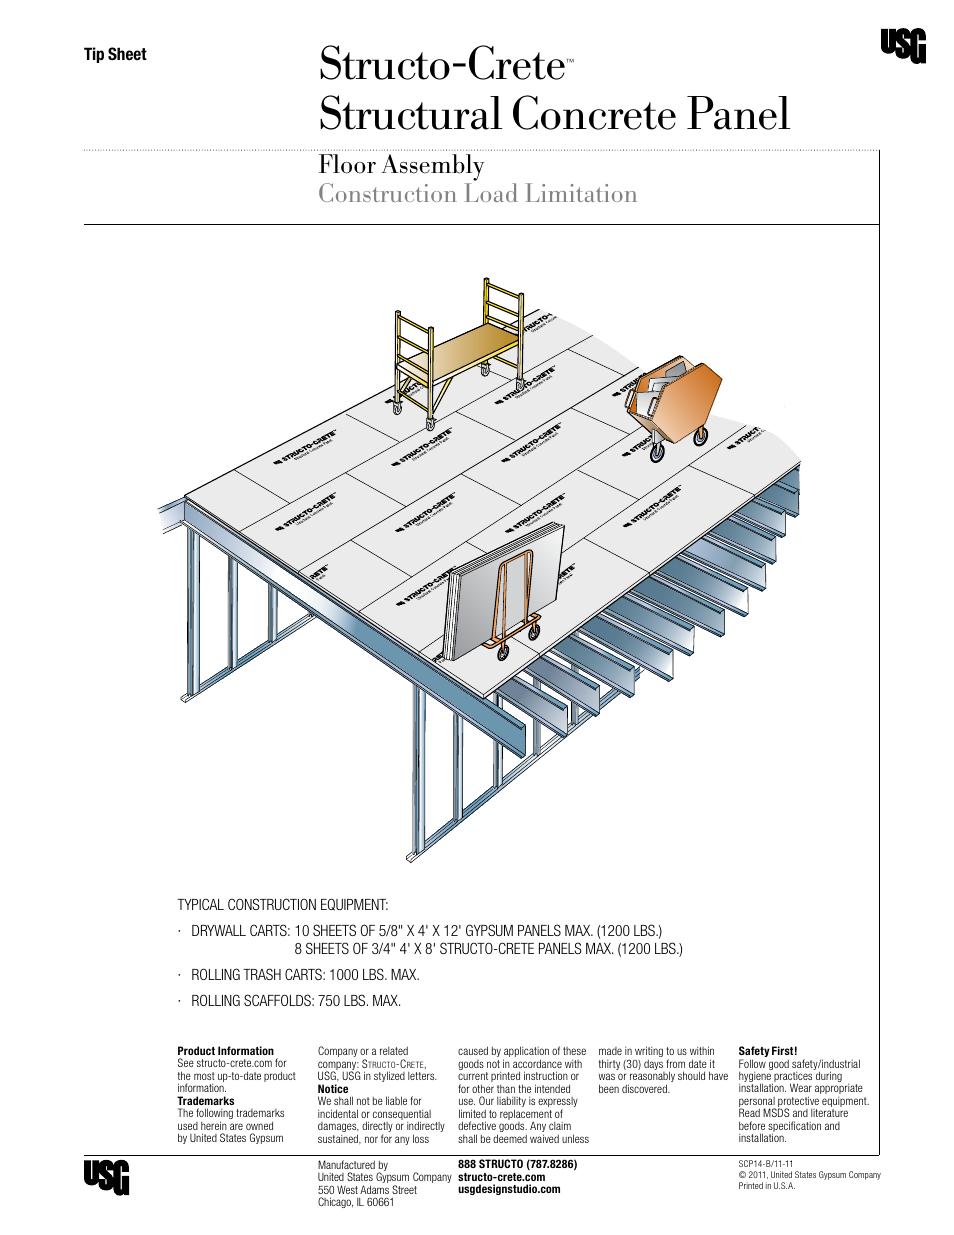 Structo Crete Structural Concrete Panel Floor Assembly